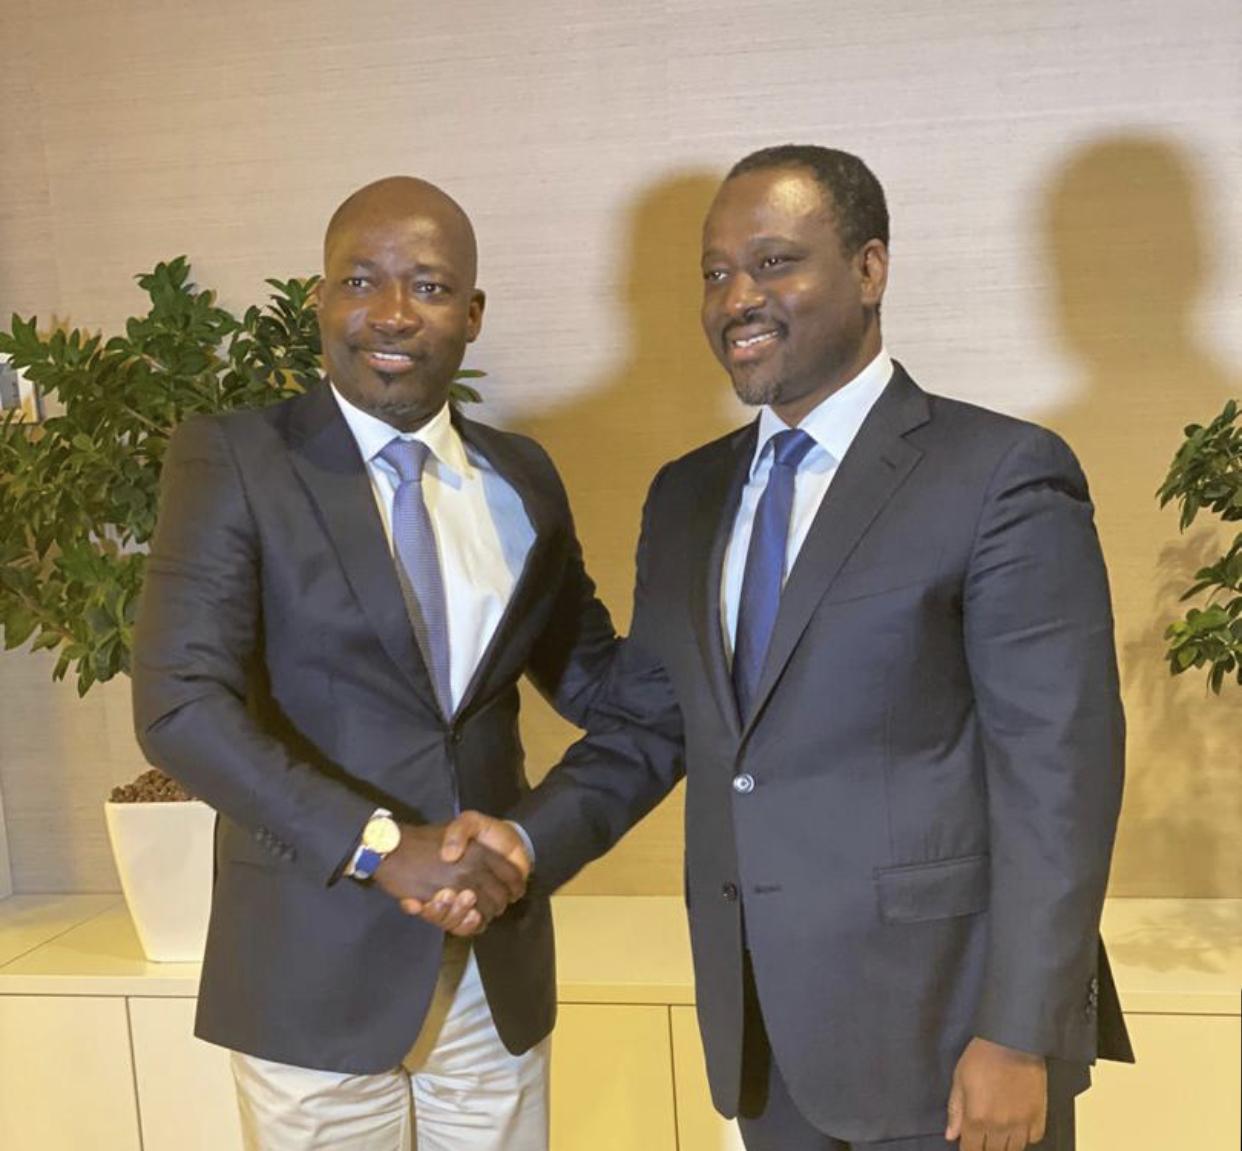 rencontre entre gay presidents à Drancy